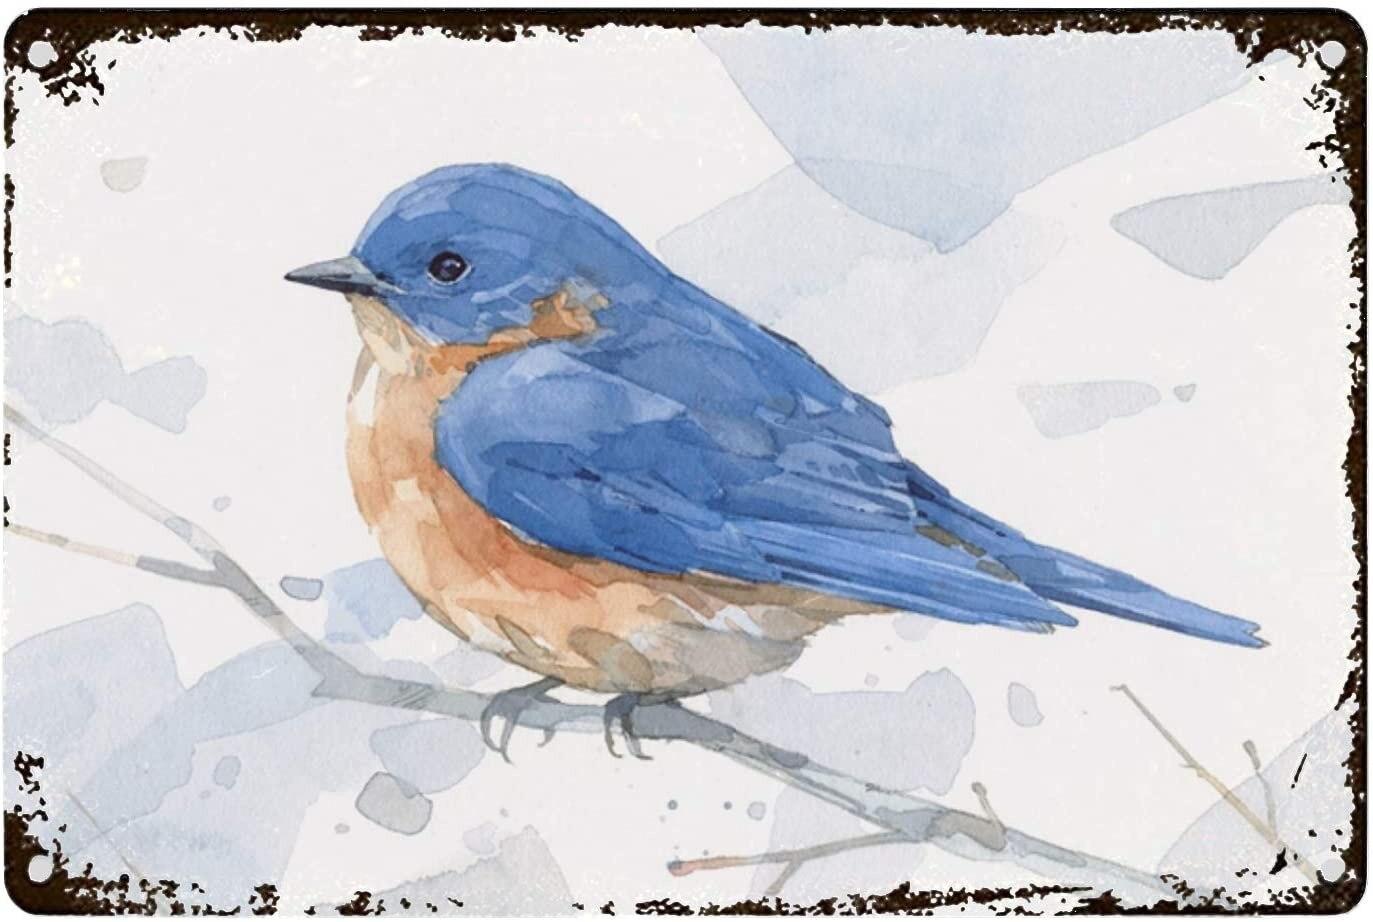 Miaoquhe Bluebird-cartel de acuarela del cártel de hojalata de Metal Vintage cartel de pared de placa